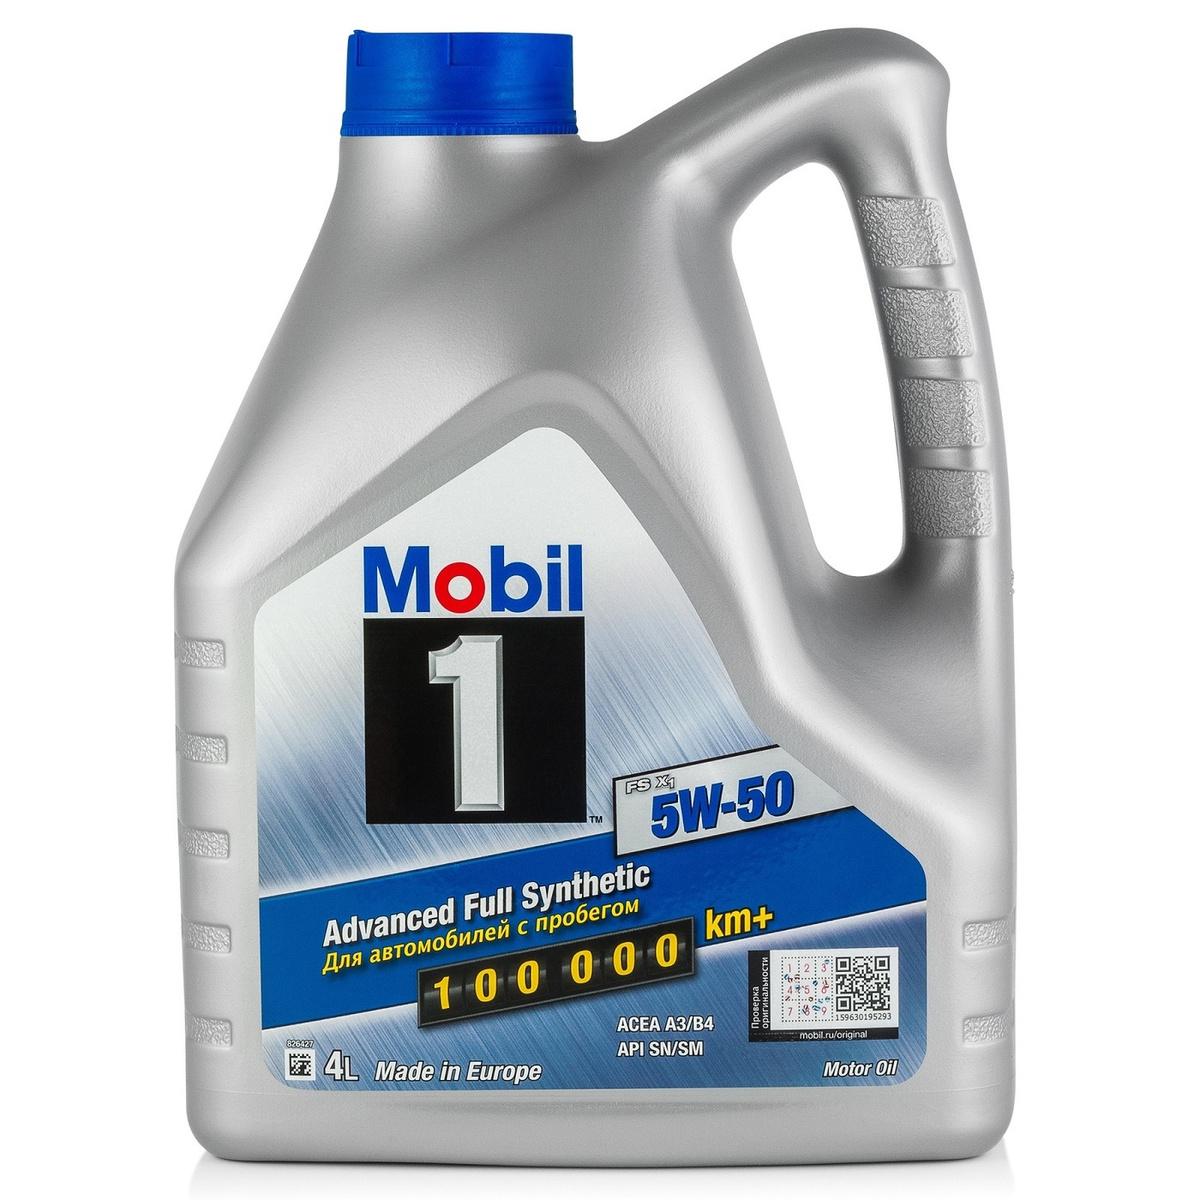 Моторное масло Mobil 1 FS X1 5W-50, 4л. #1